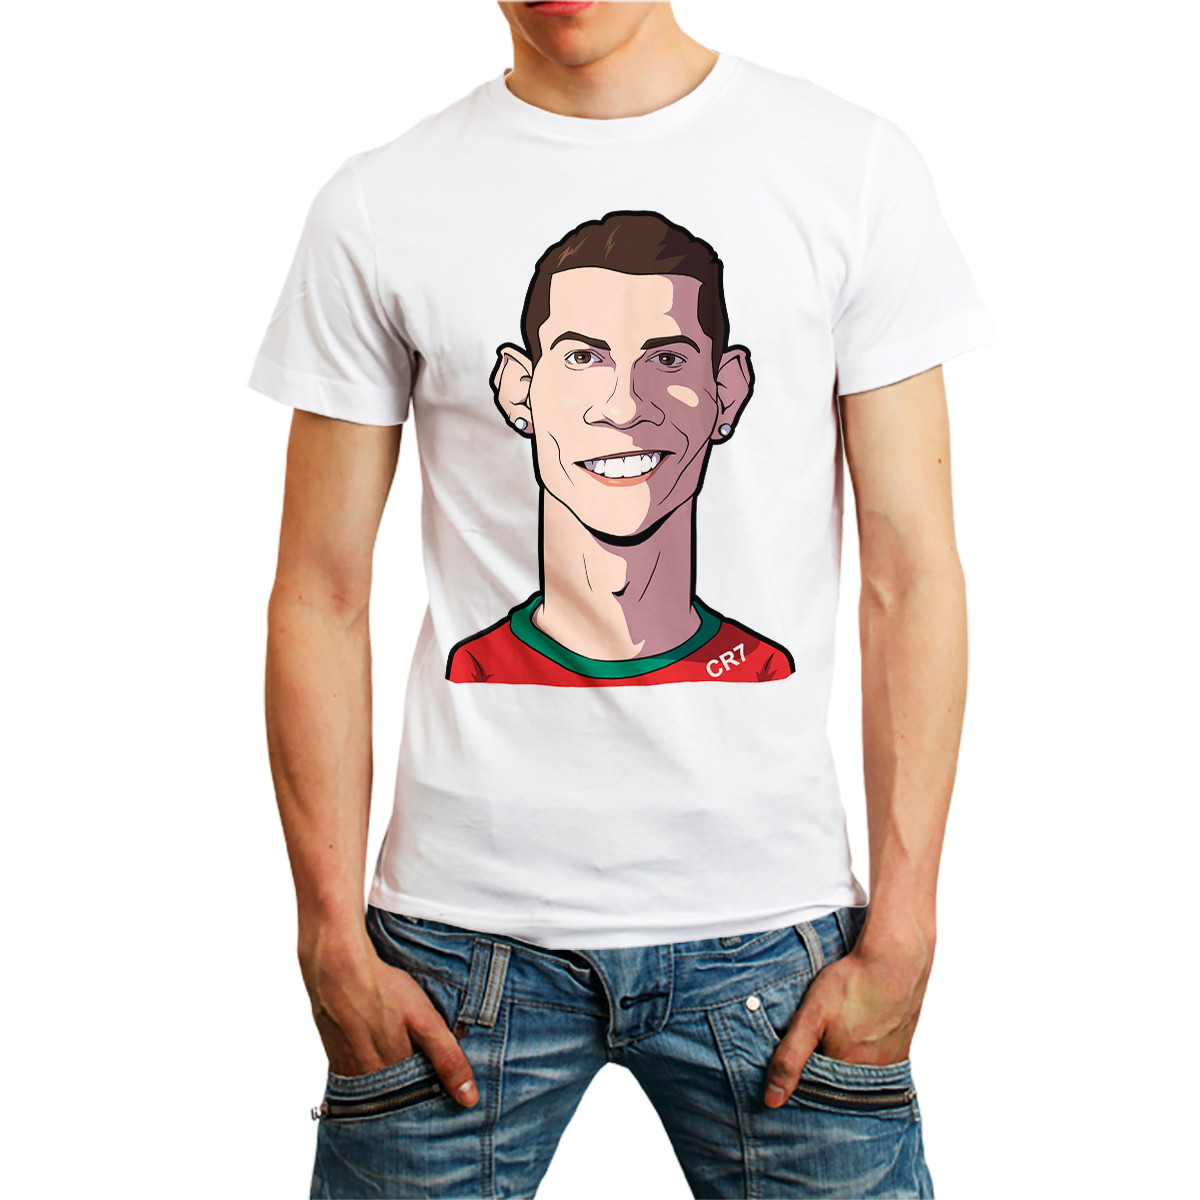 112a650721 Camiseta Cr7 Cristiano Ronaldo Juventus Camisa Futebol